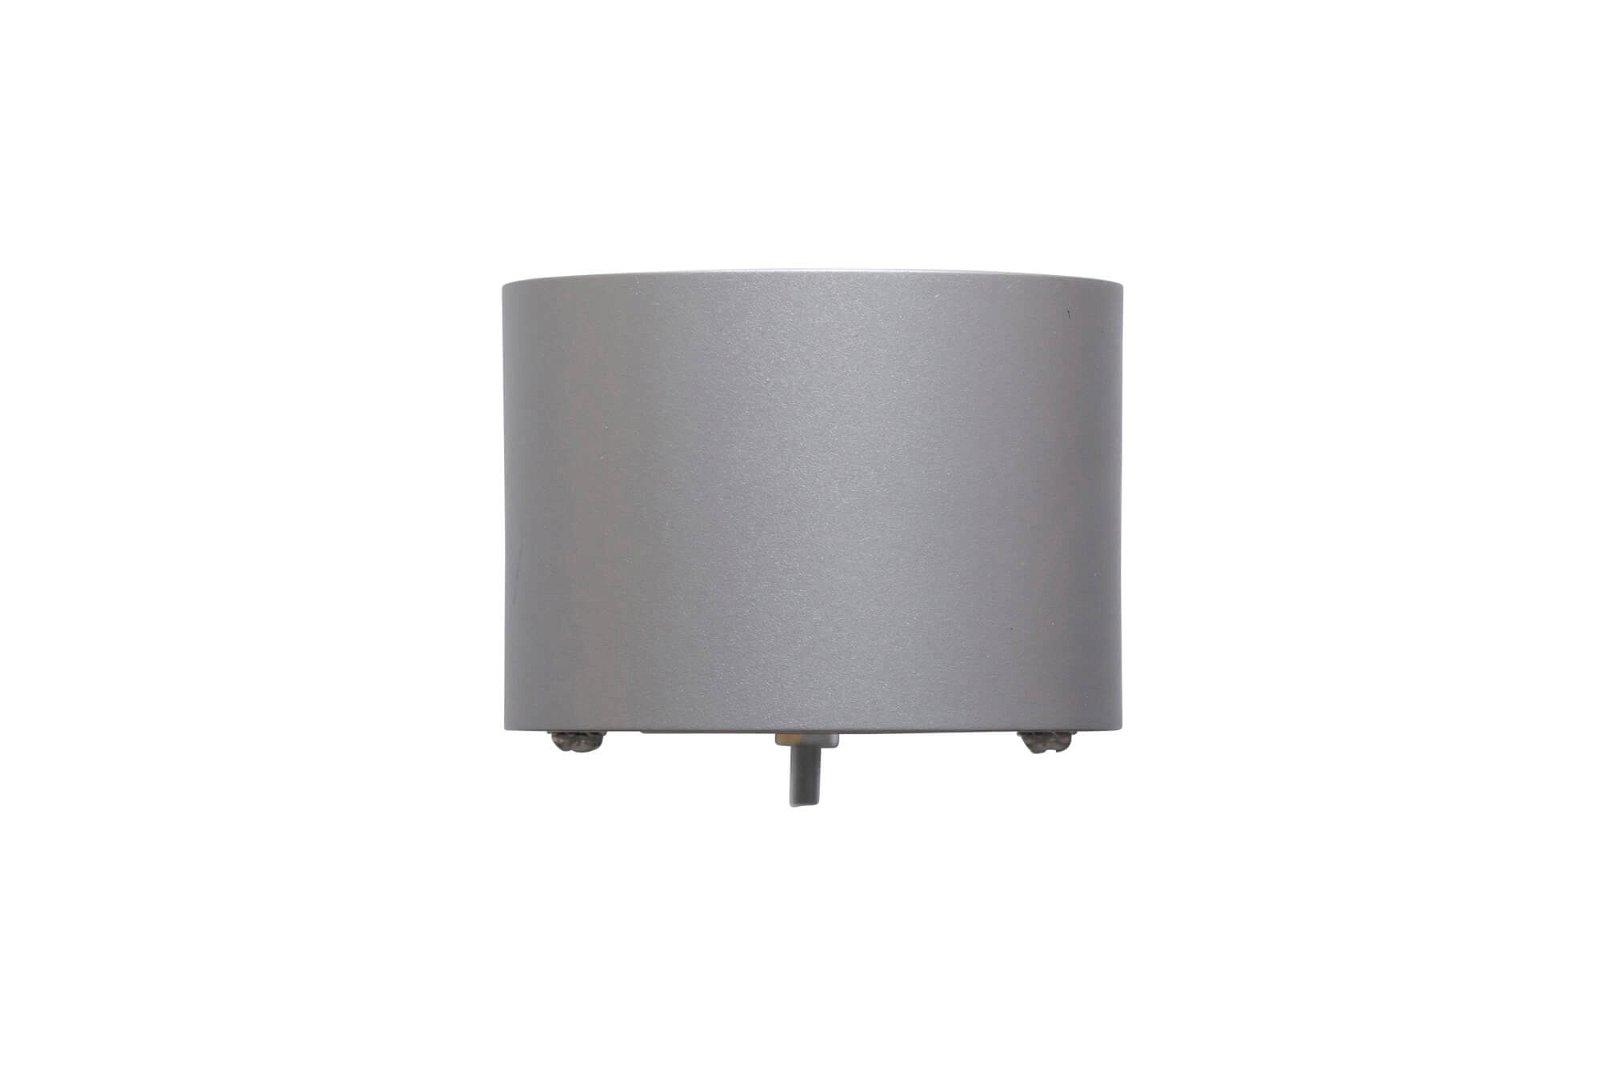 LED-Pendelleuchte MAULstraight, 36 W, 127,5 cm, silber